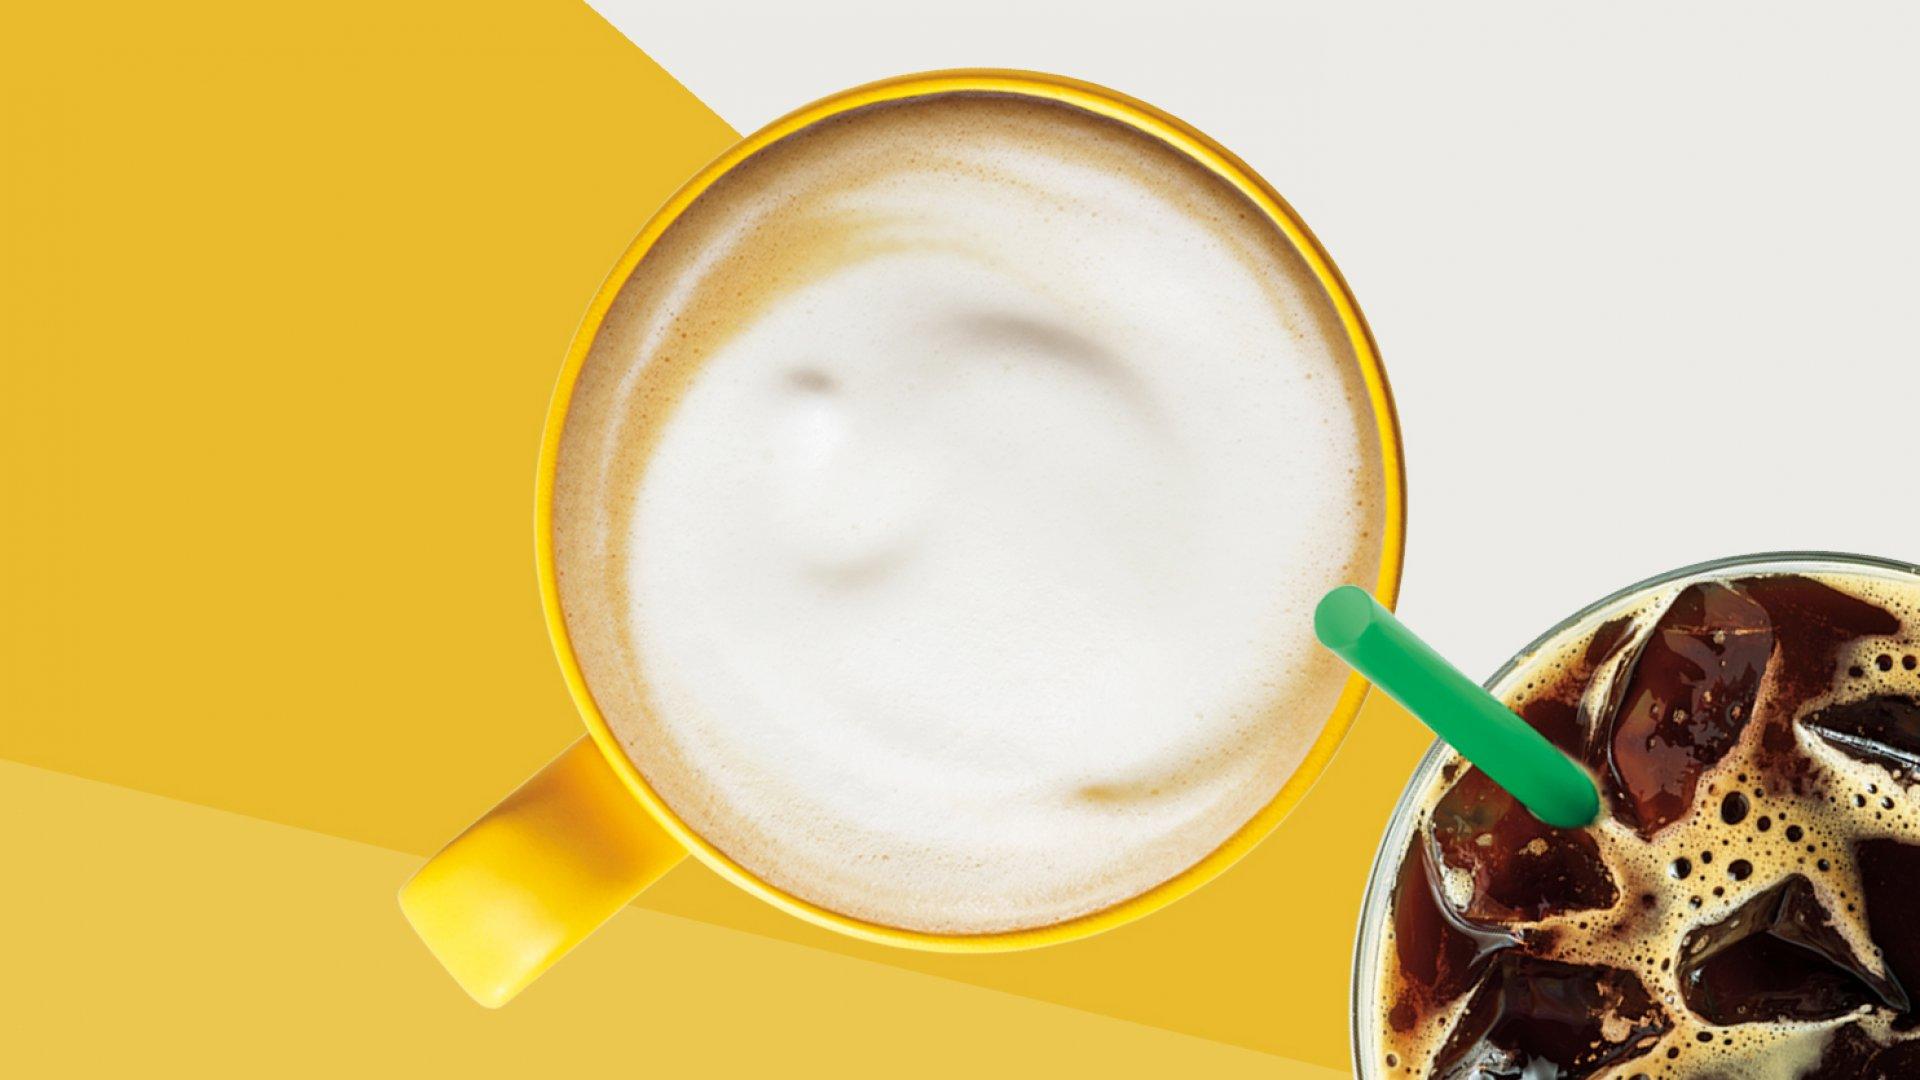 Starbucks Blonde Espresso.